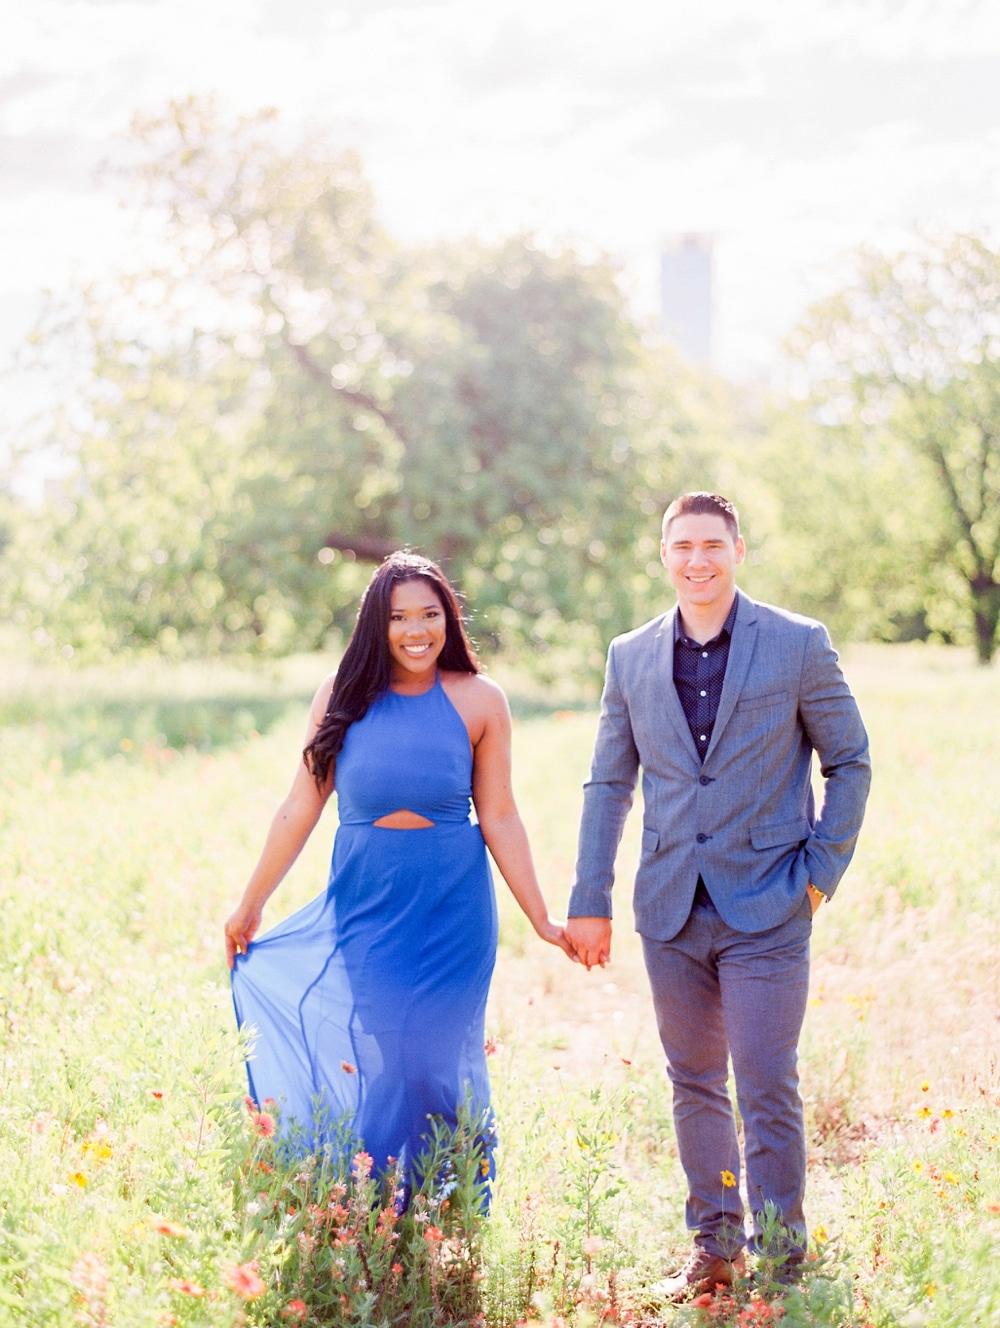 kristin-la-voie-photography-austin-wedding-photographer-10